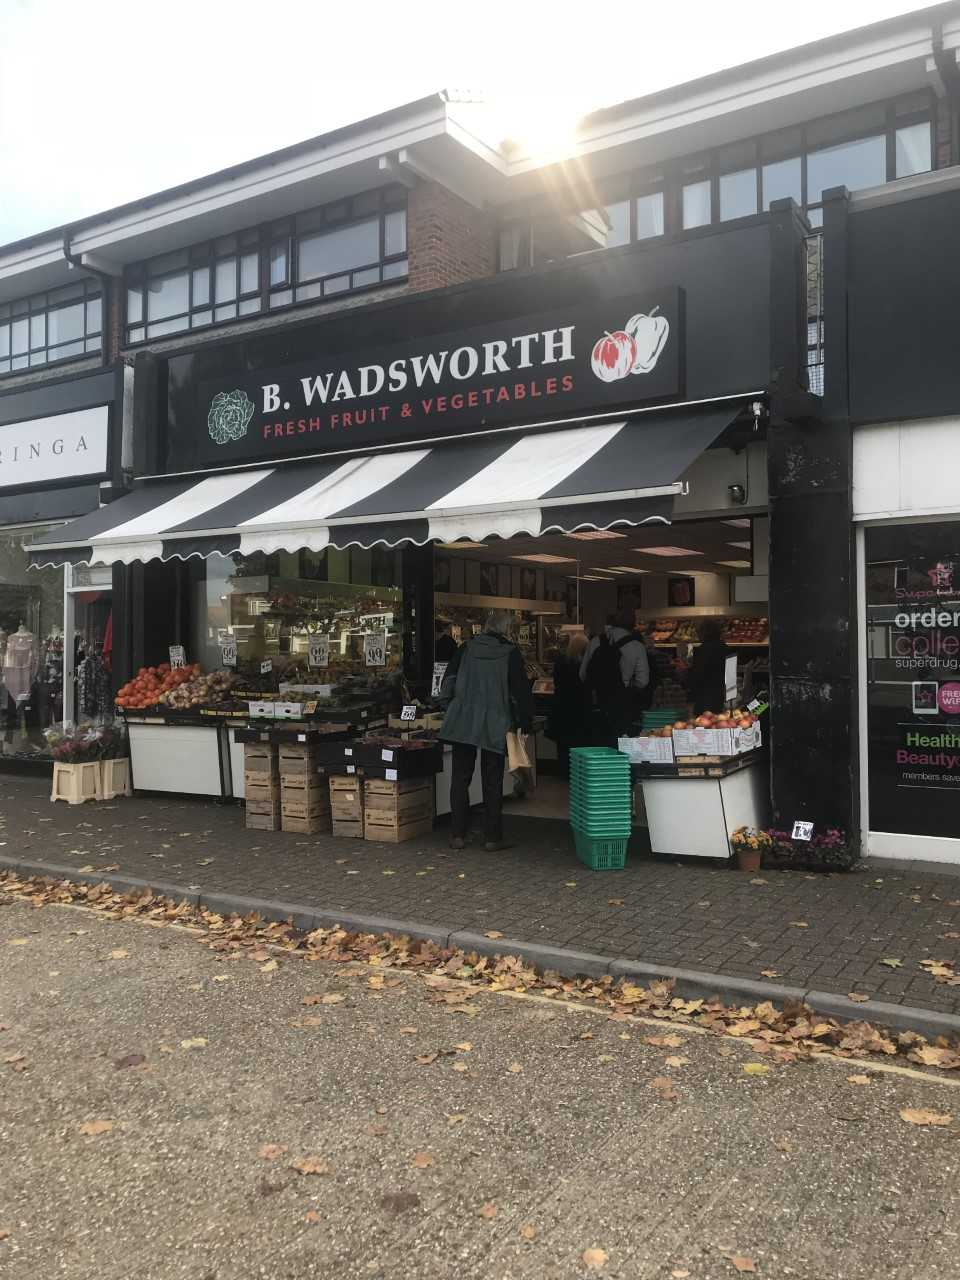 B. Wadsworth in Rustington